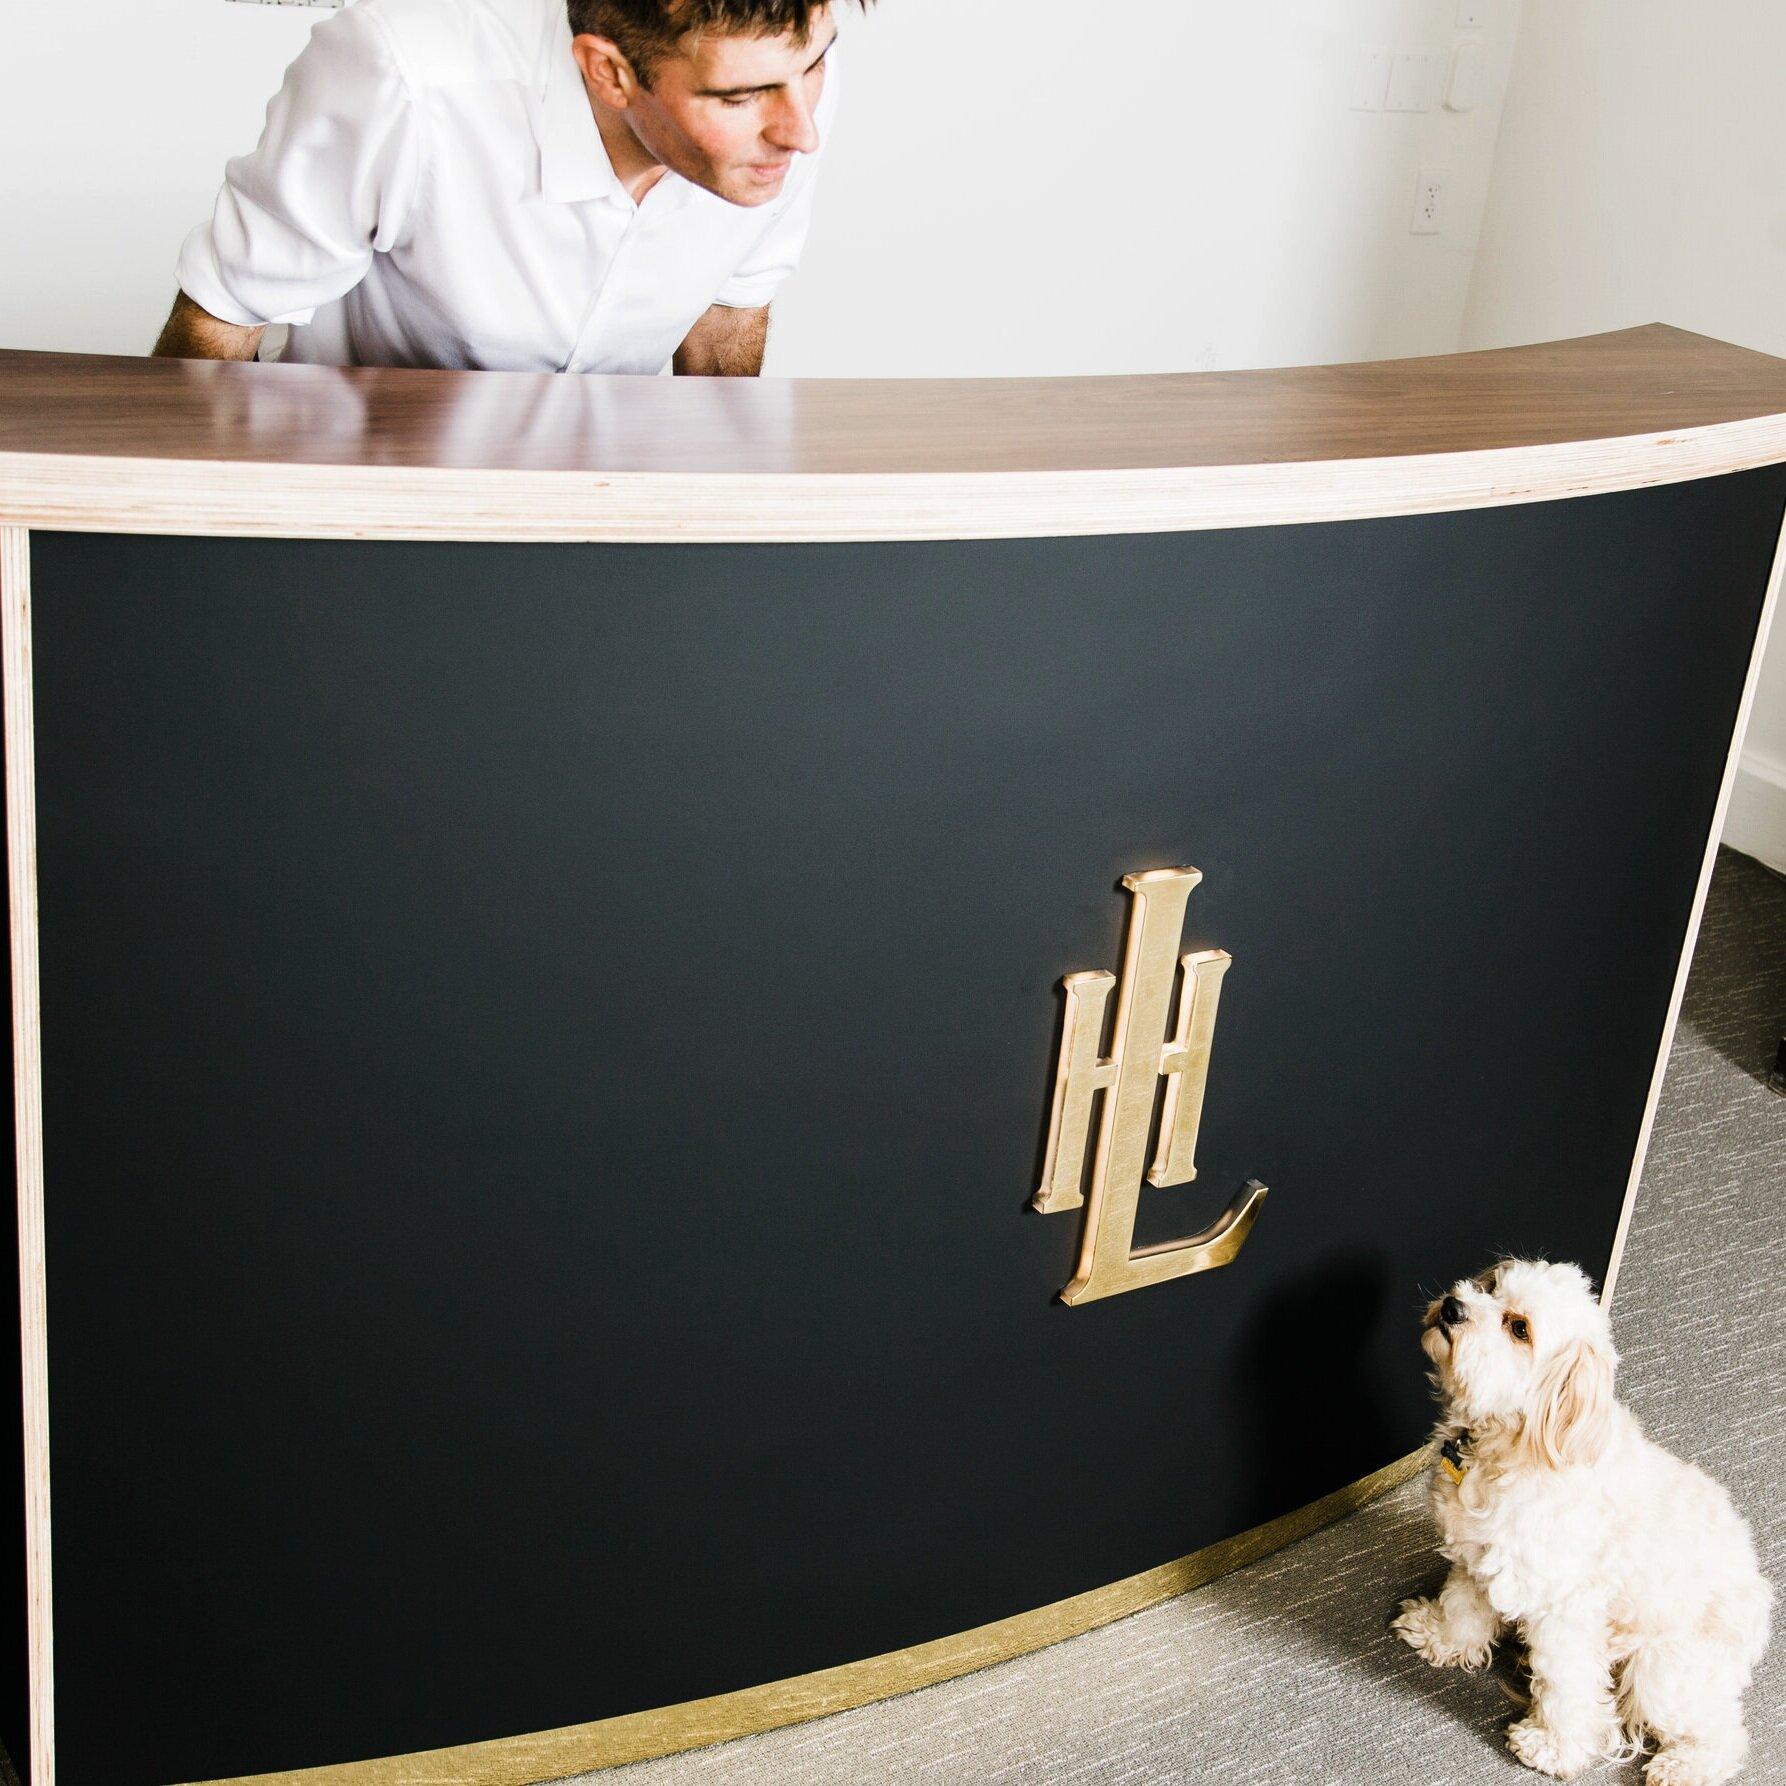 Hotel+Leo+Front+Desk-21.jpg